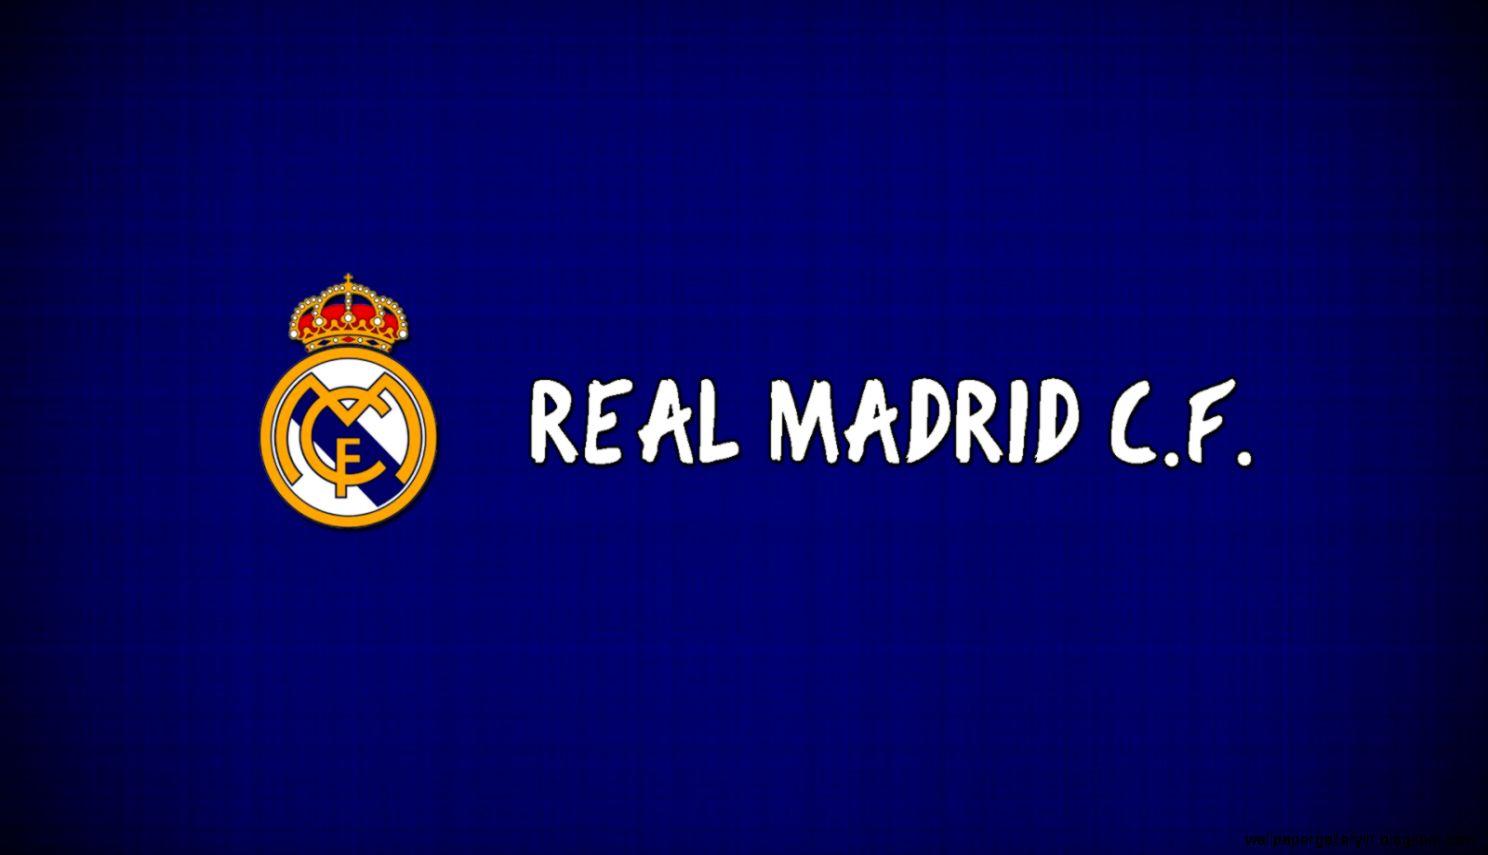 Real Madrid Blue Logo Hd Wallpaper Gallery